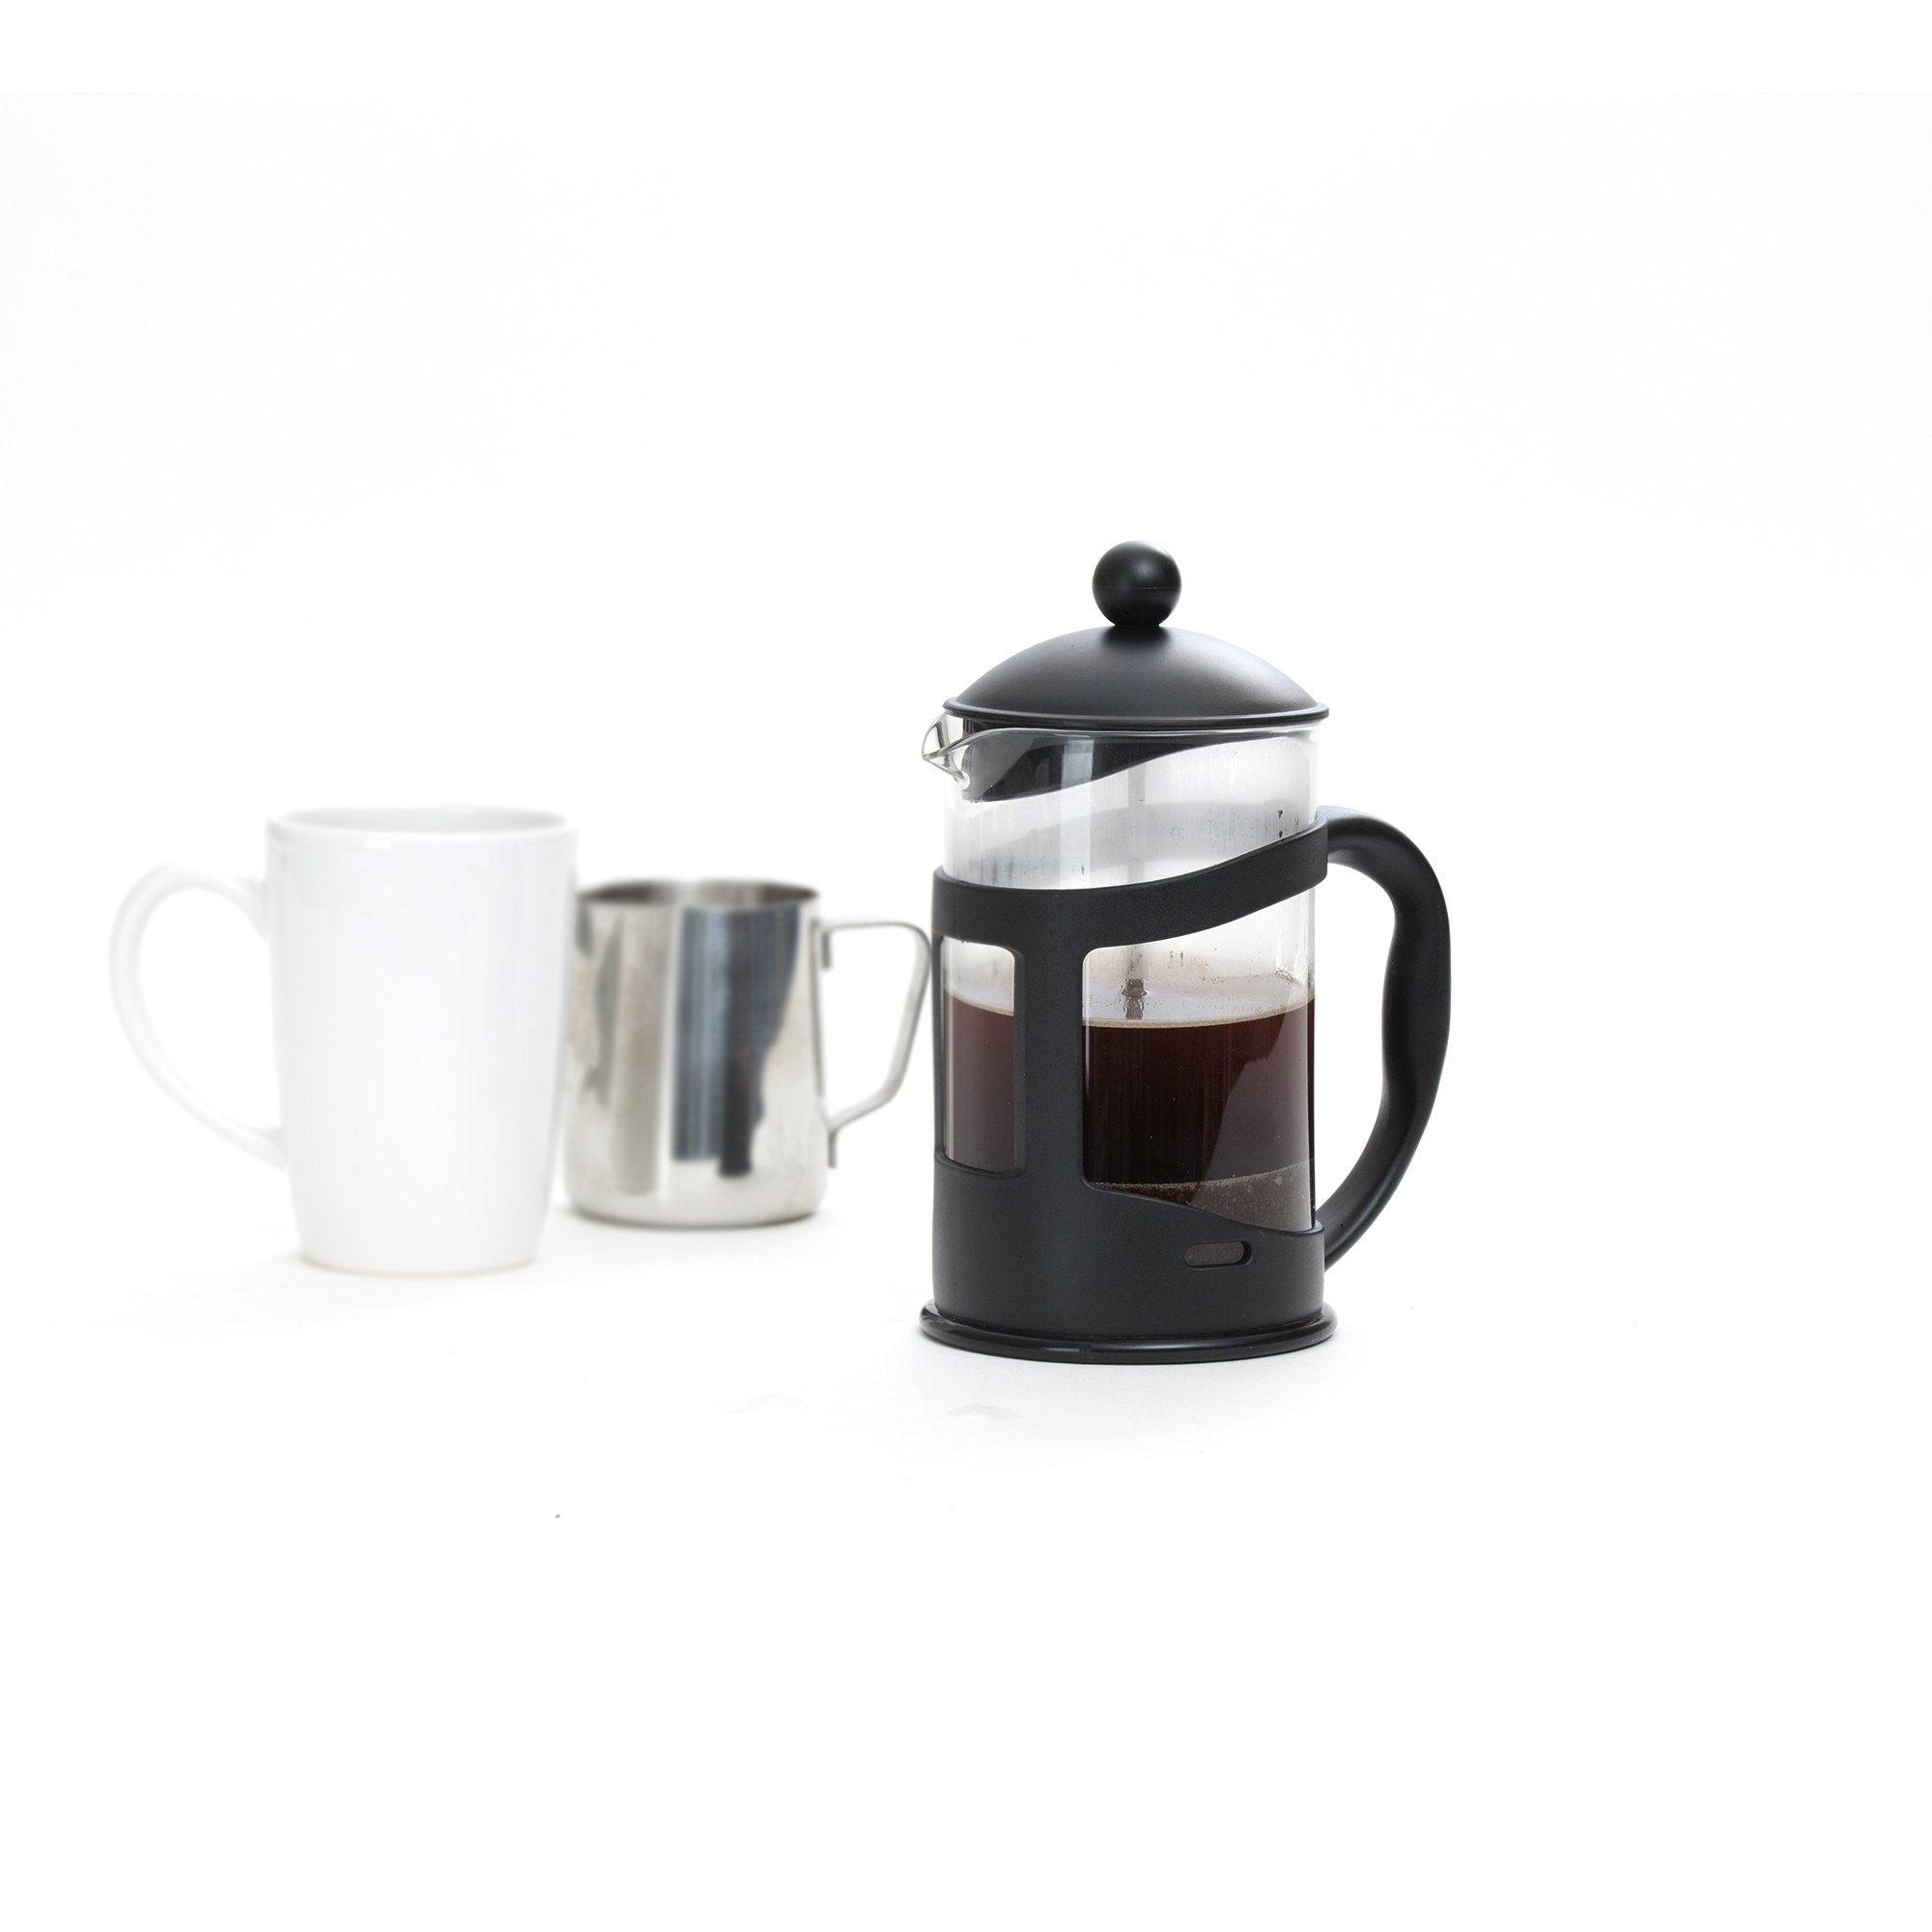 Mind Reader French Press Coffee & Tea Maker 27 oz, Glass by Mind Reader (Image #2)